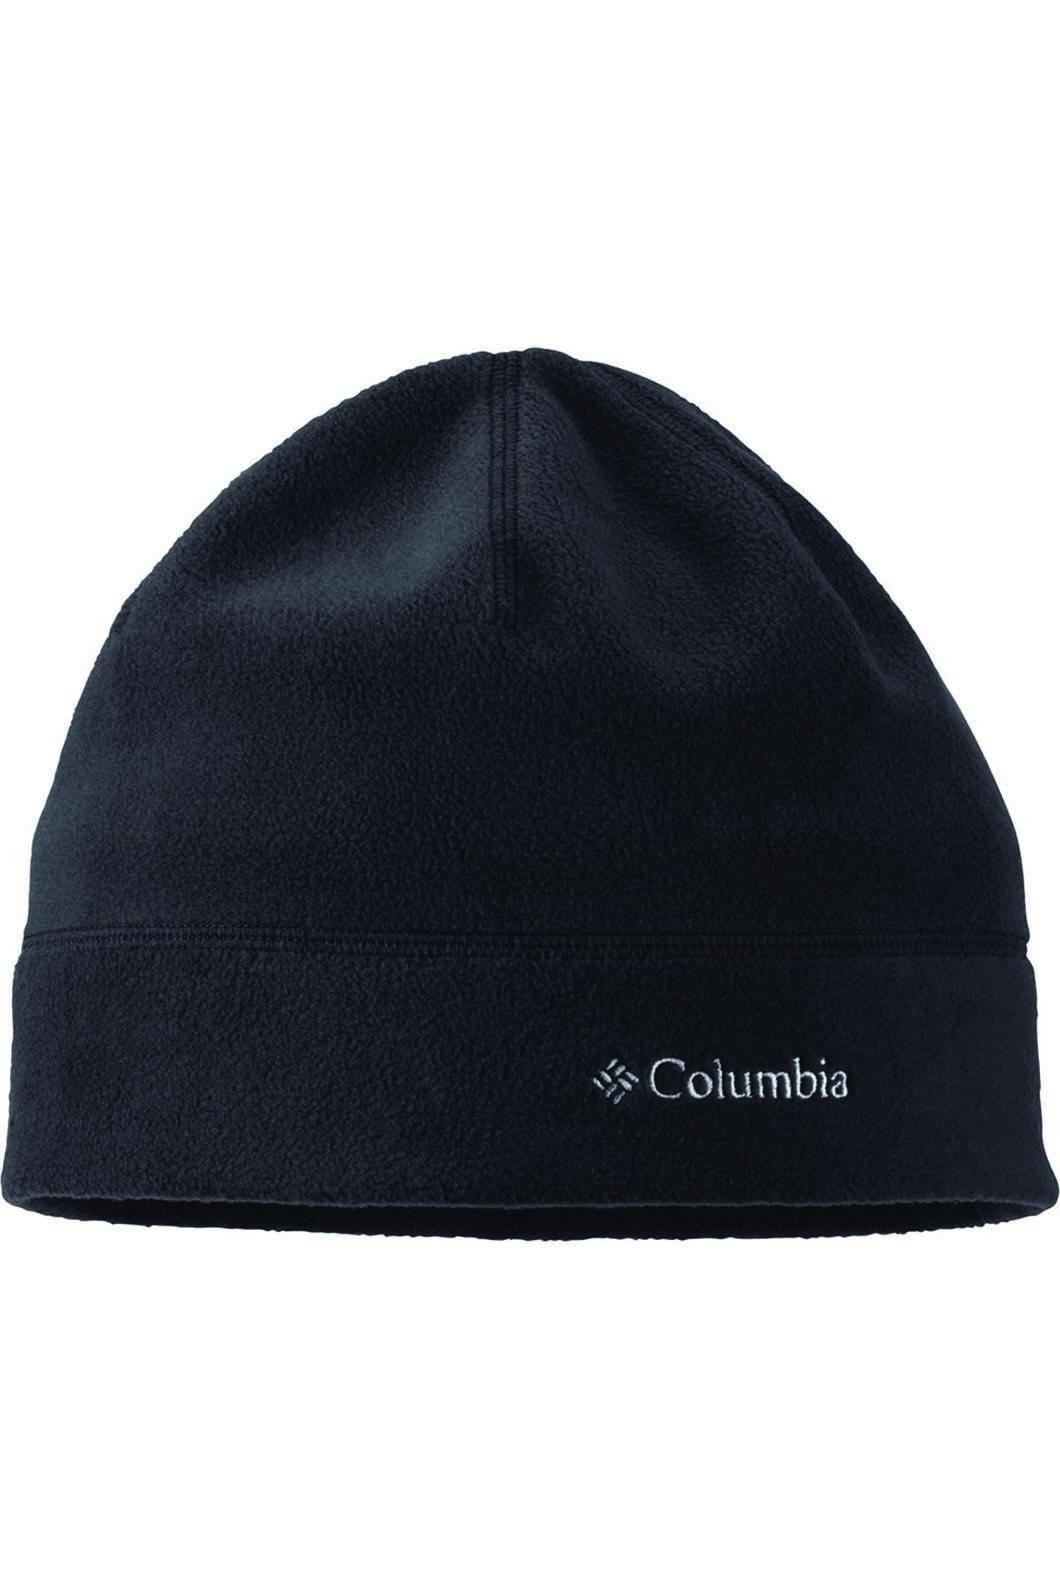 Columbia Unisex Thermerator Beanie, Black, hi-res